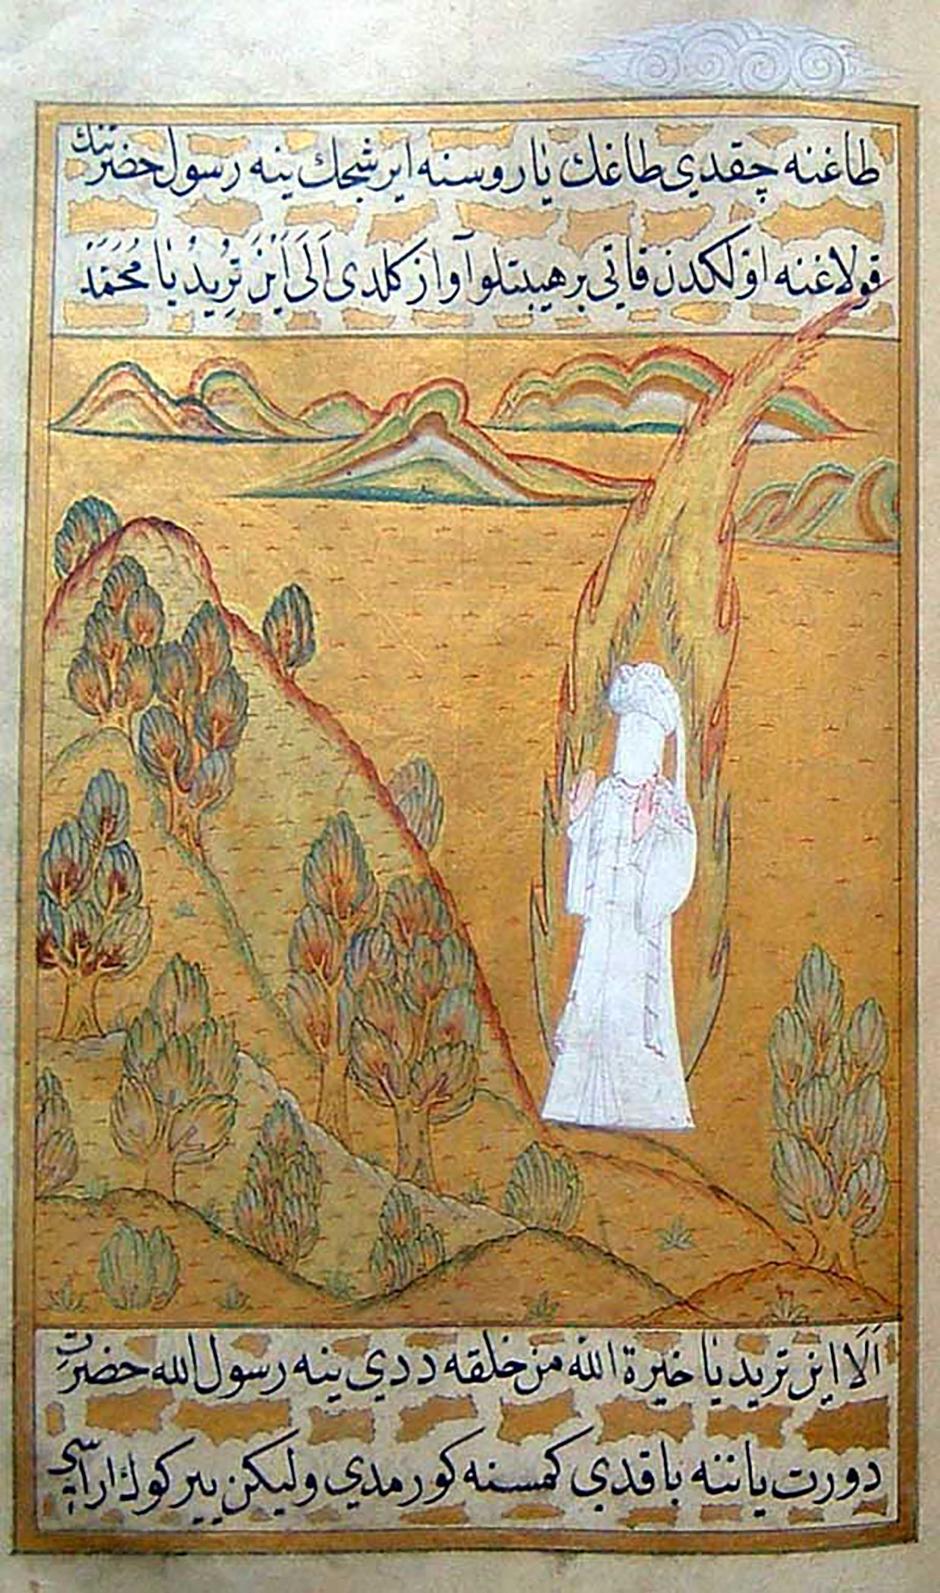 The Prophet Muhammad receives revelations at Mount Hira, al-Darir, Siyer-i Nebi (The Biography of the Prophet), Istanbul, Ottoman lands, 1595-1596. TOPKAPI PALACE LIBRARY